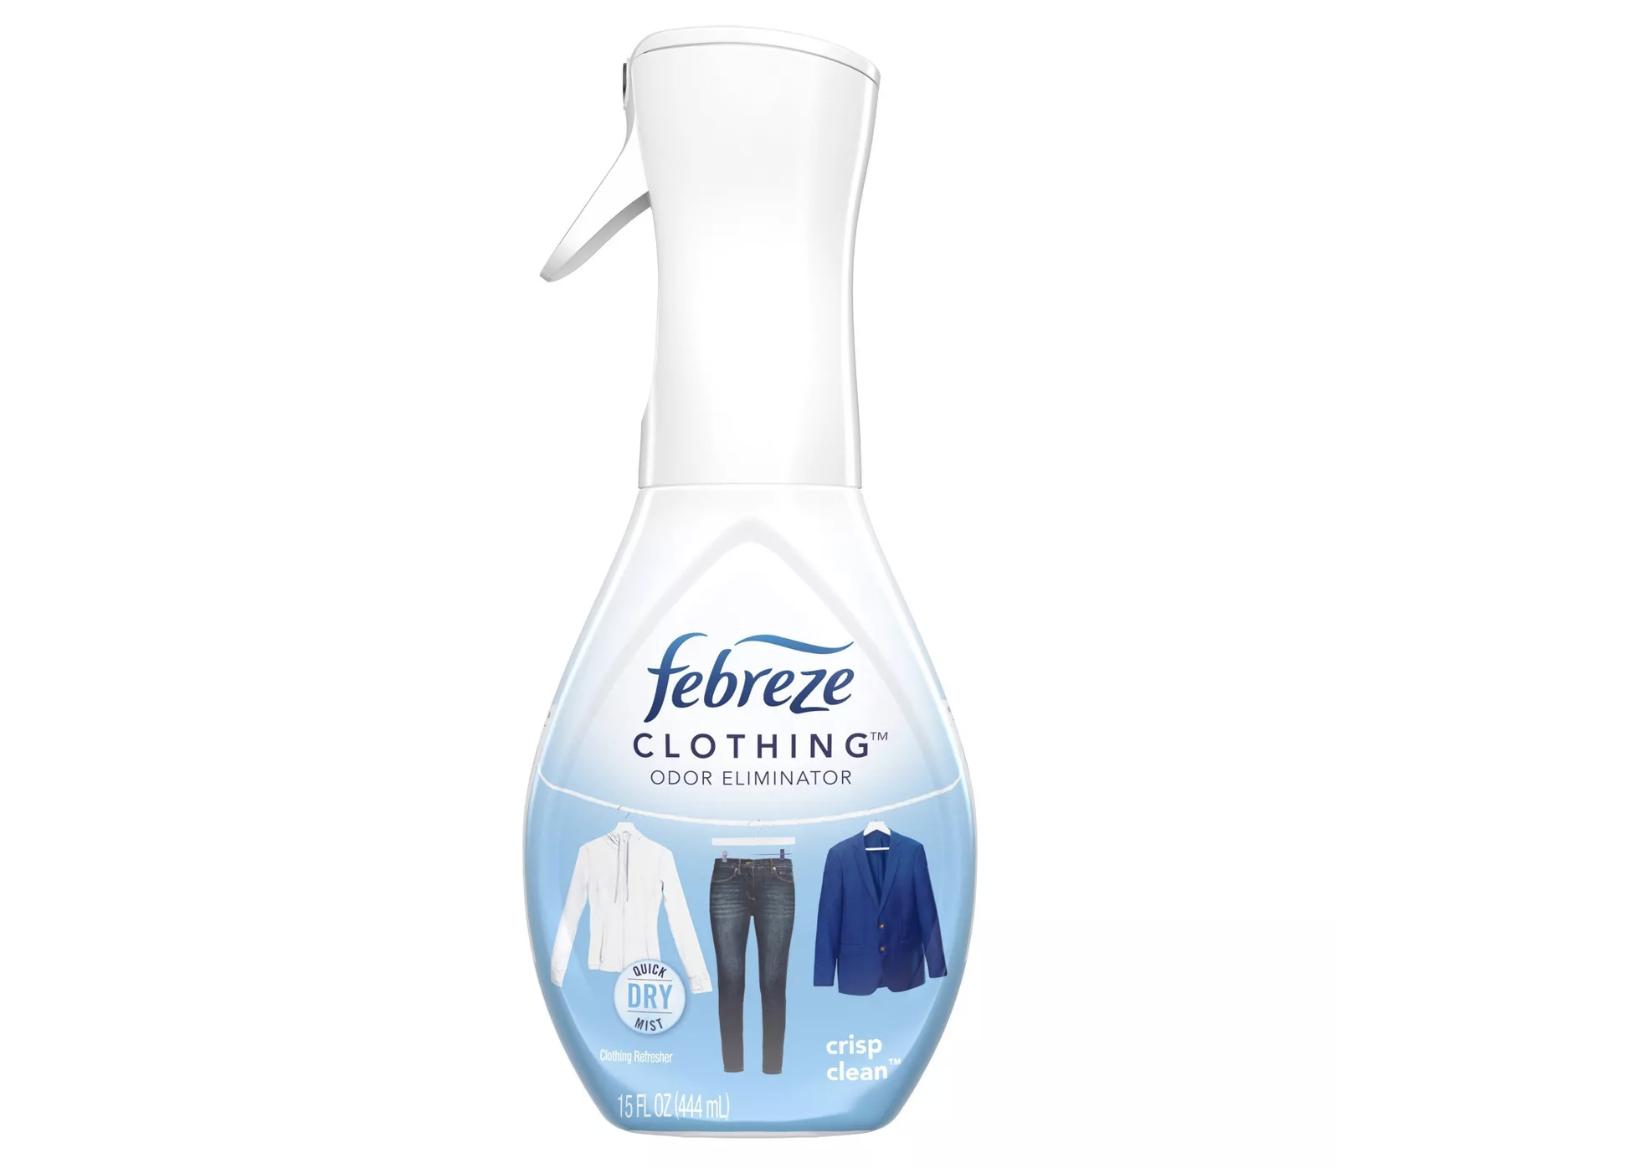 Febreze clothing odor eliminator